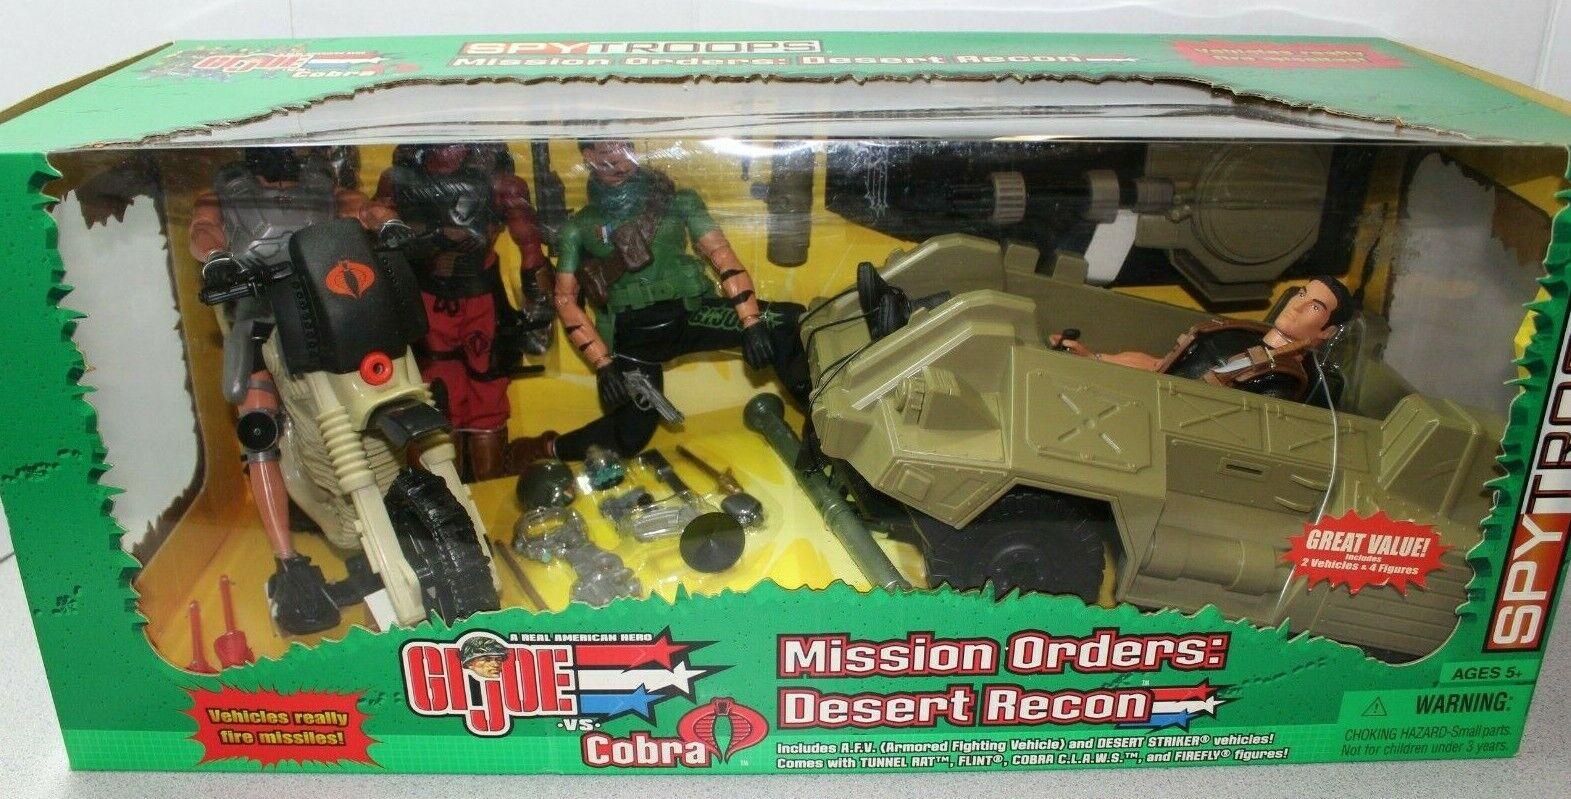 GI Joe Mission Orders  Desert Recon 2 Vehicles & 4 12 inch figures